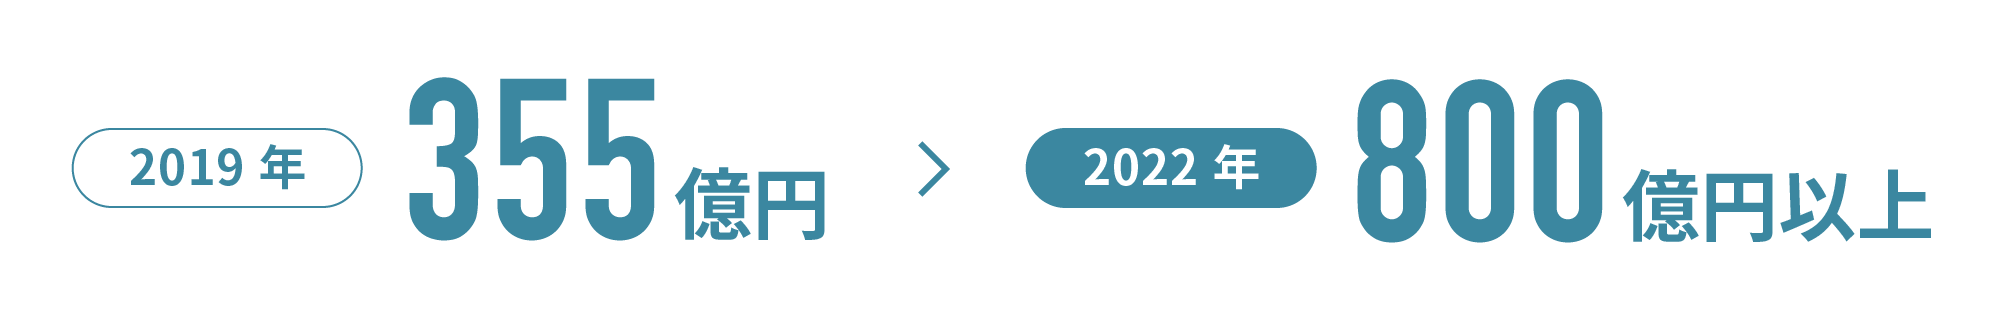 HRTech市場規模